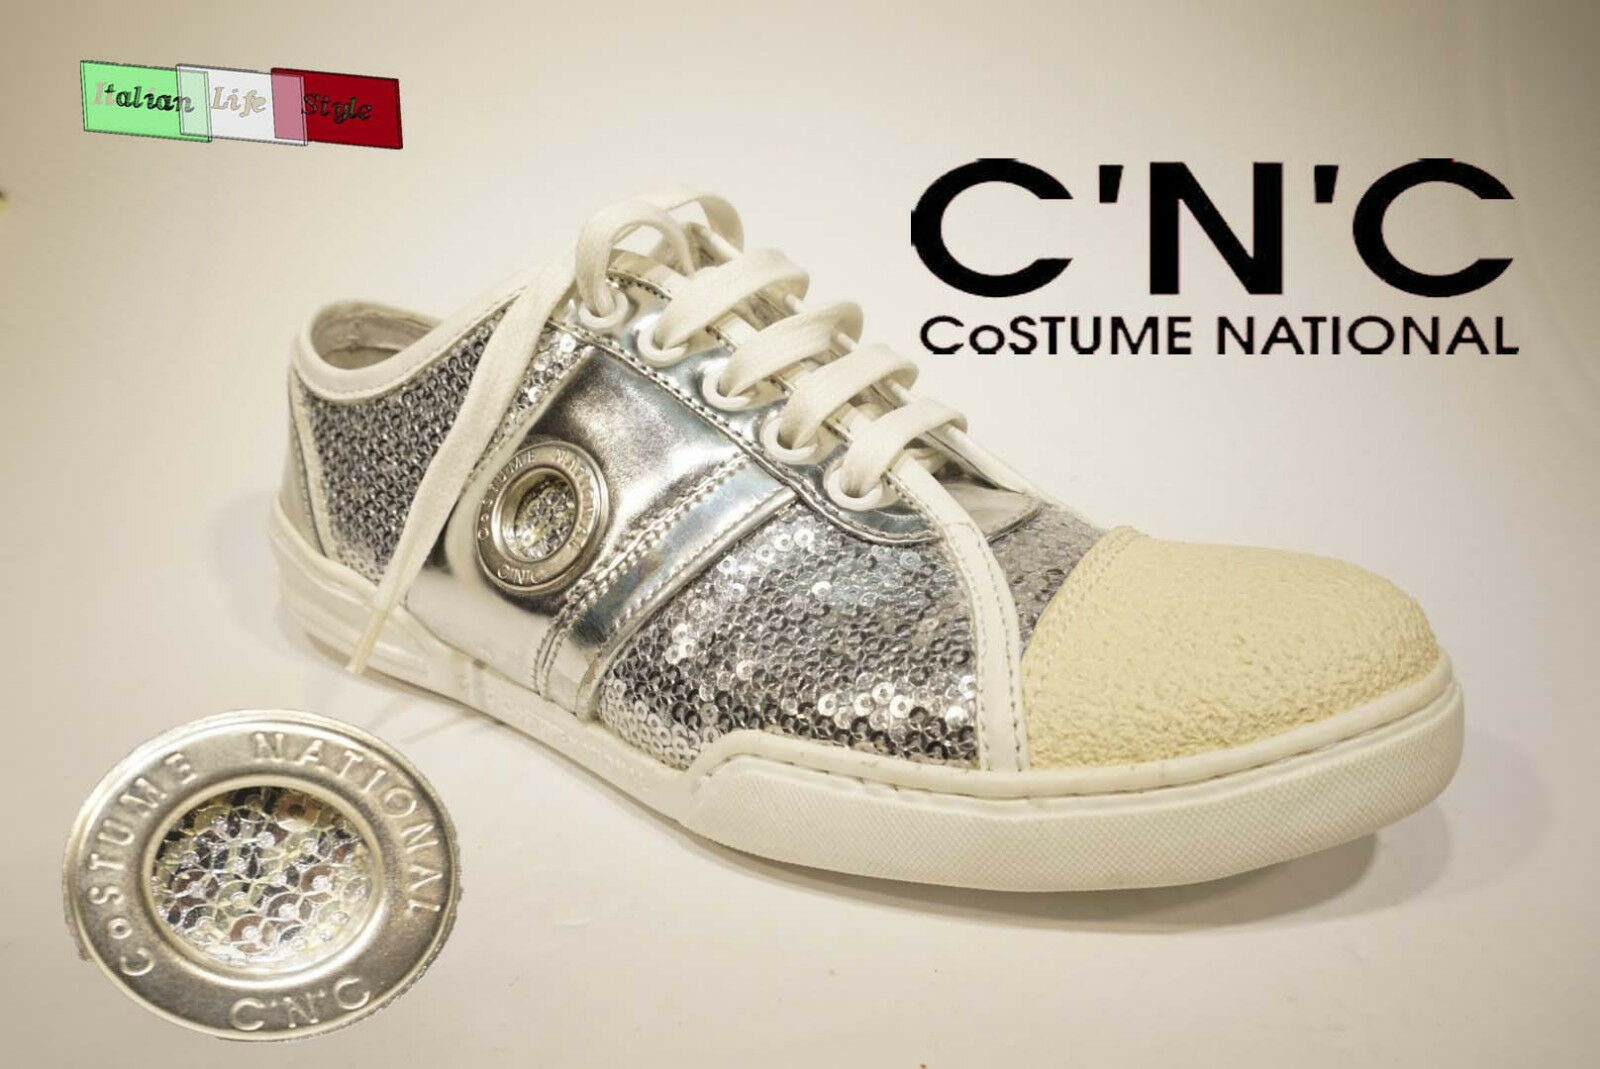 Nuove scarpe da donna CoSTUME NATIONAL Sneakers argento in vera pelle color argento Sneakers fe8999